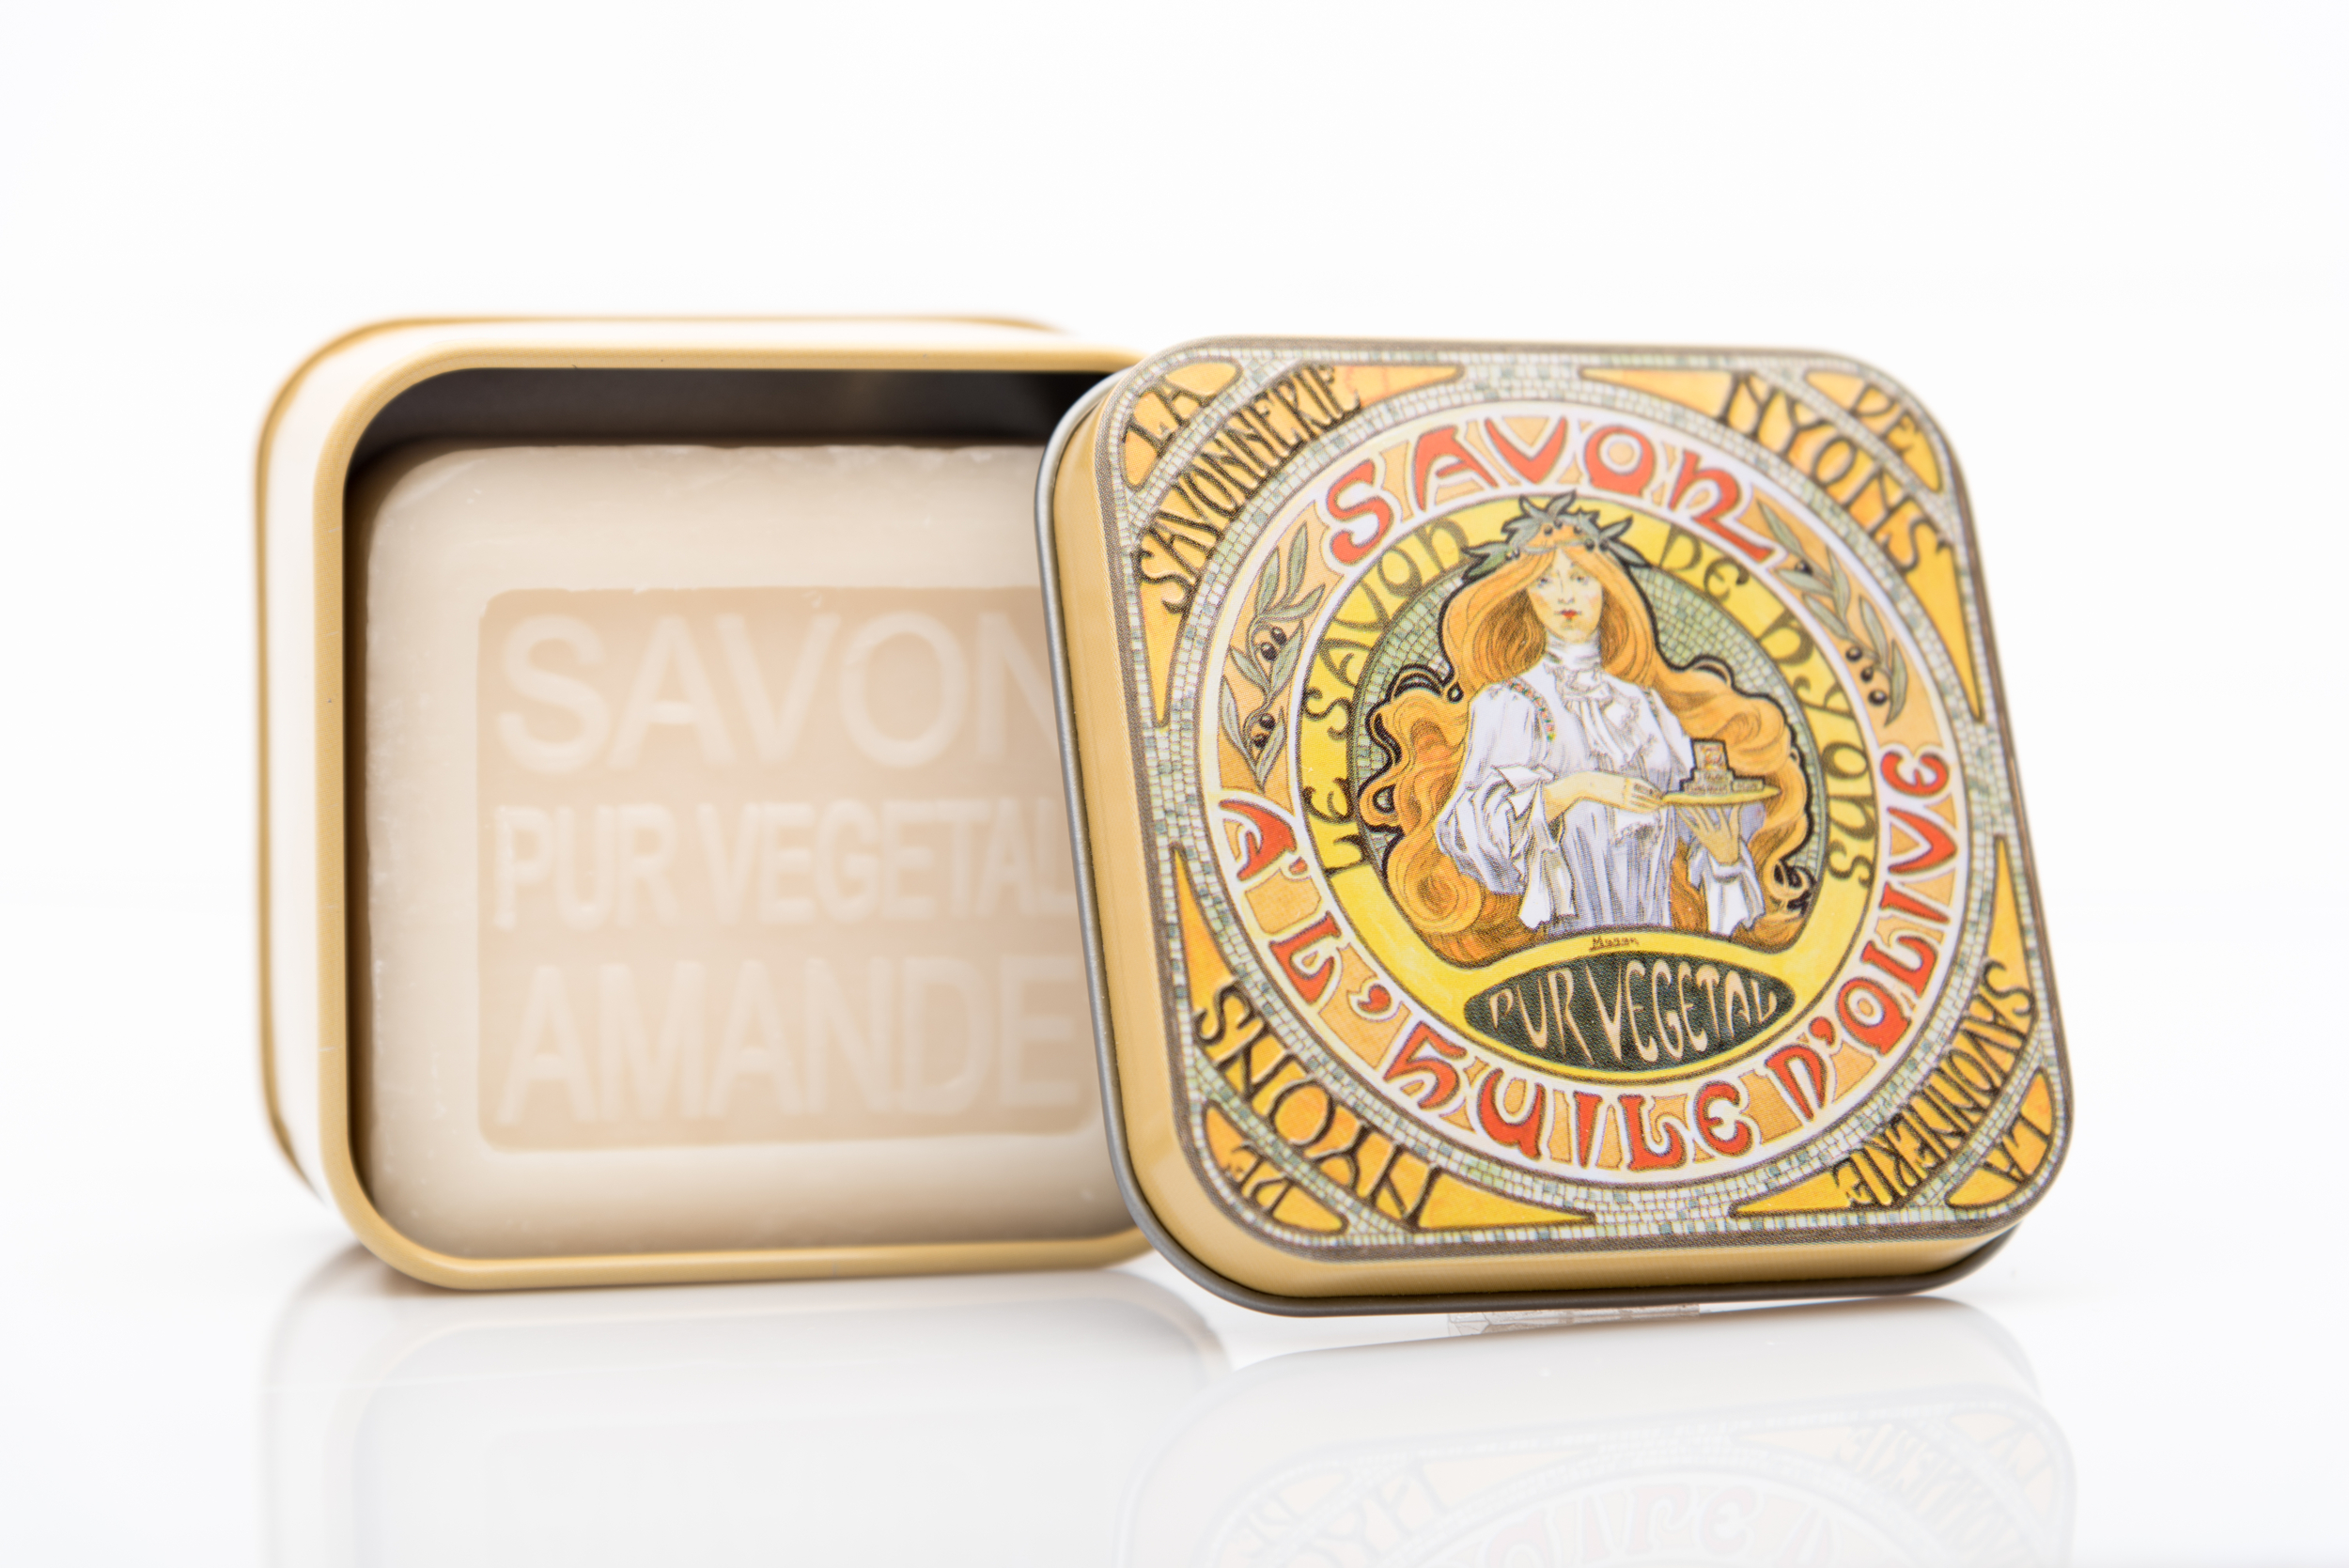 SAVON DE NYONS VEGETAL MADE IN FRANCE AVEC BOITE METALIQUE MODELE 50 AMANDE